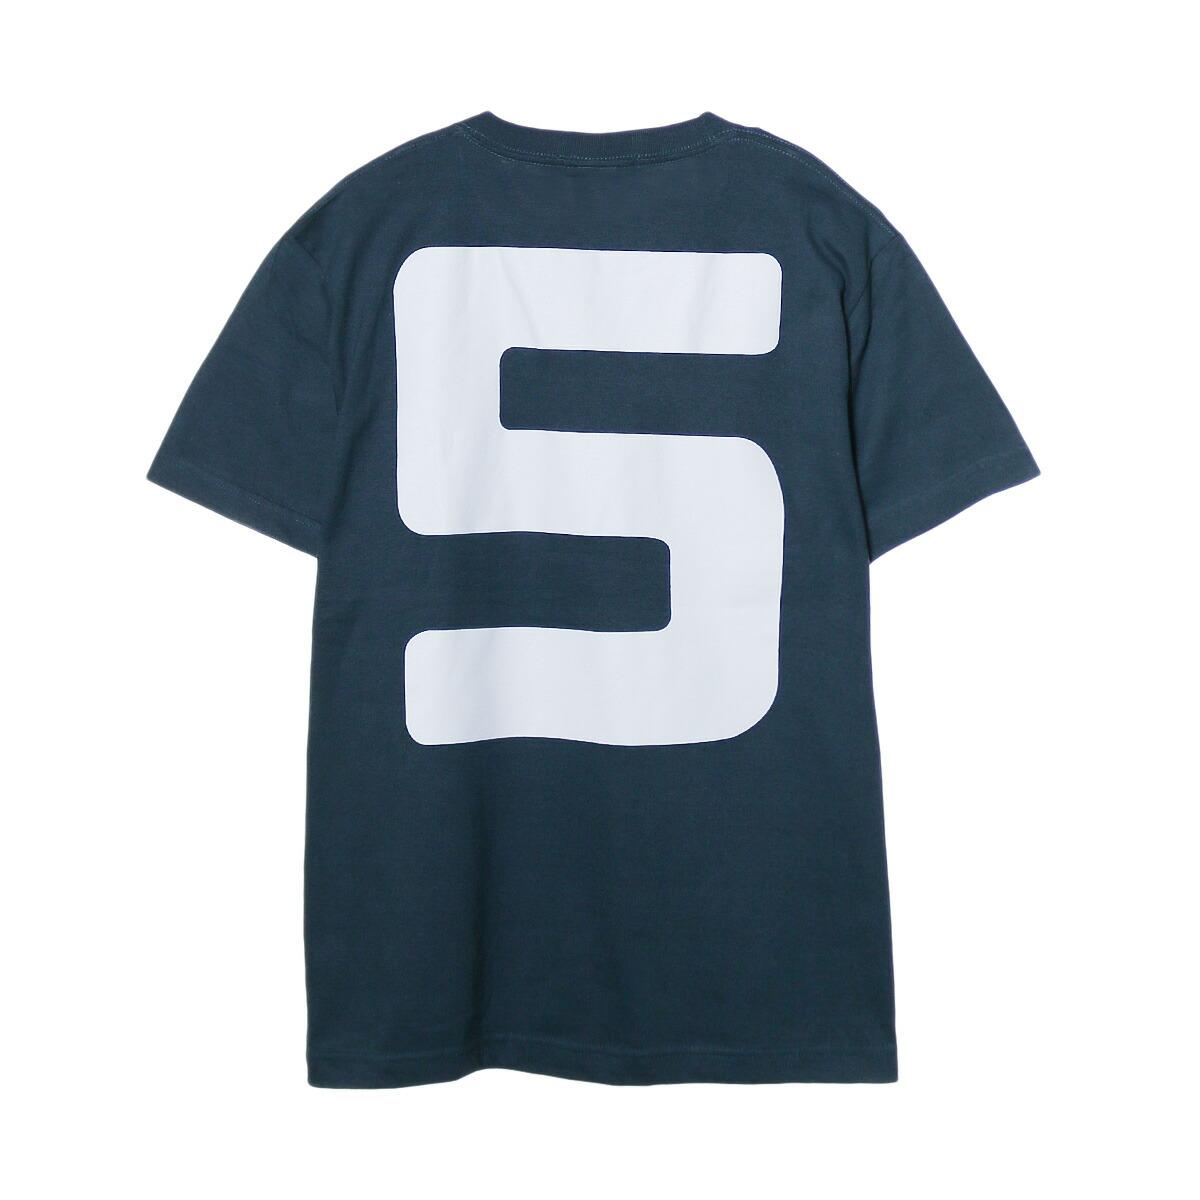 NO.5 RBV T-SHIRT